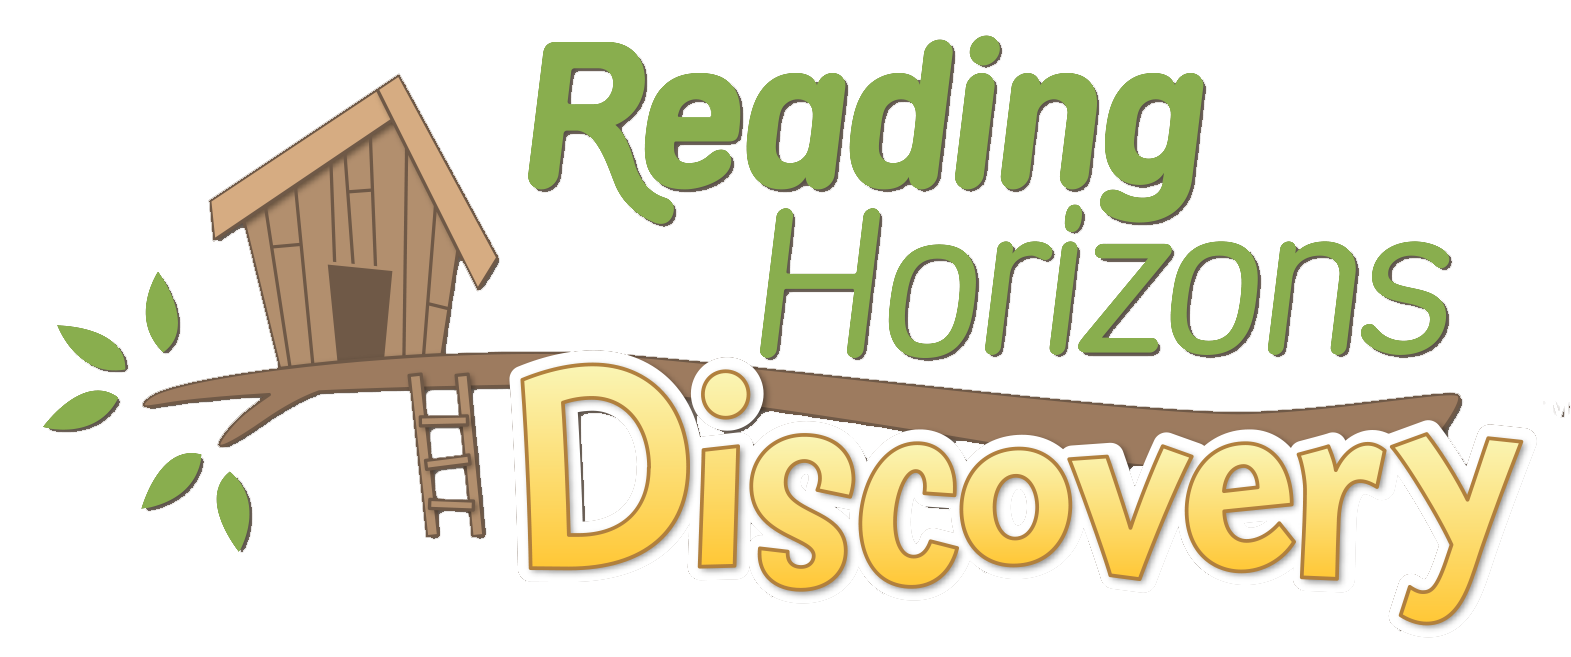 Davinci academy distance ed. Clipart reading linguistic